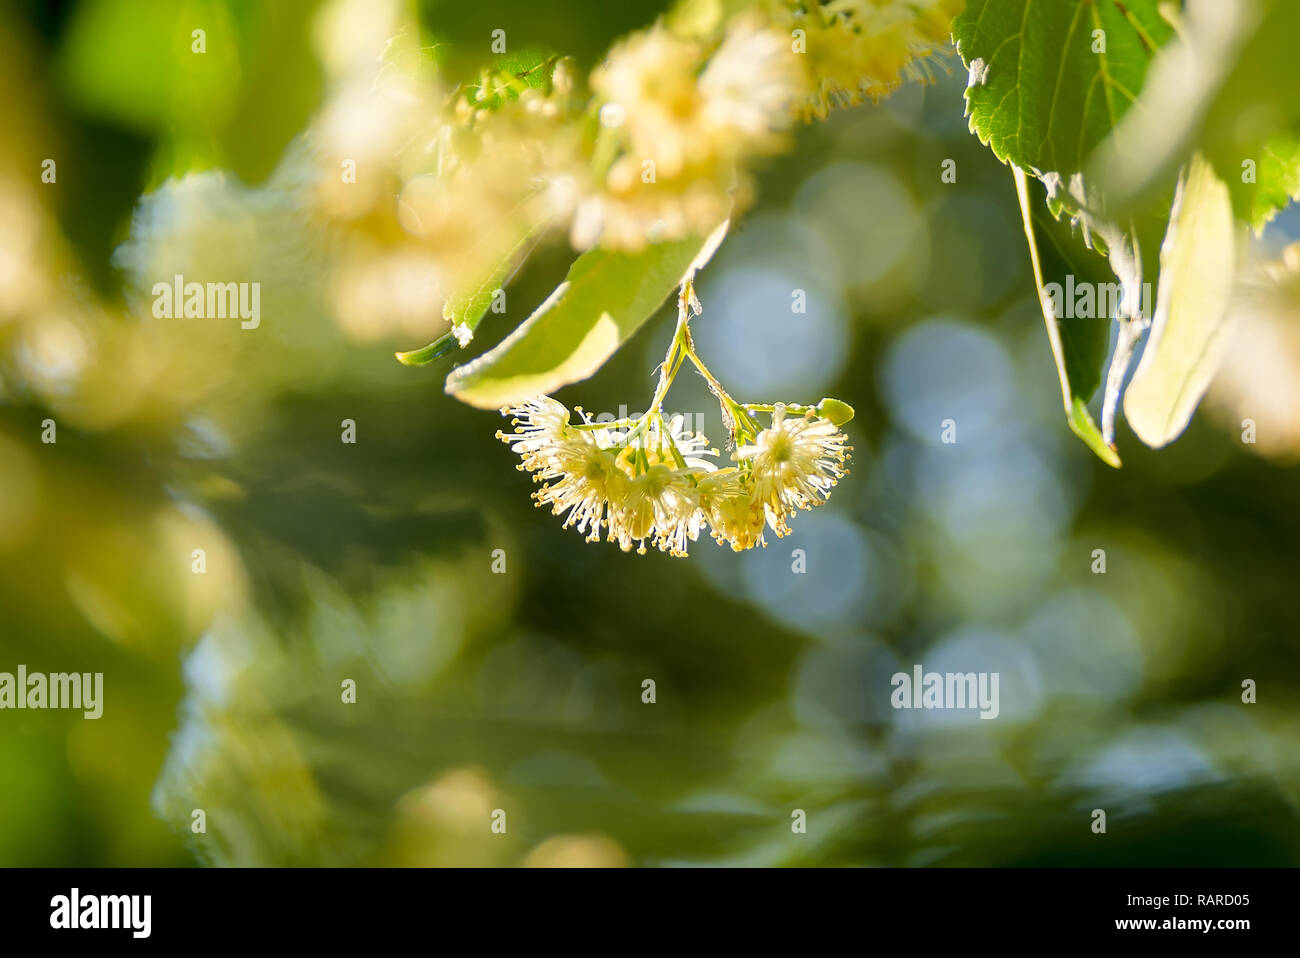 Linden flower among green leaves - Stock Image